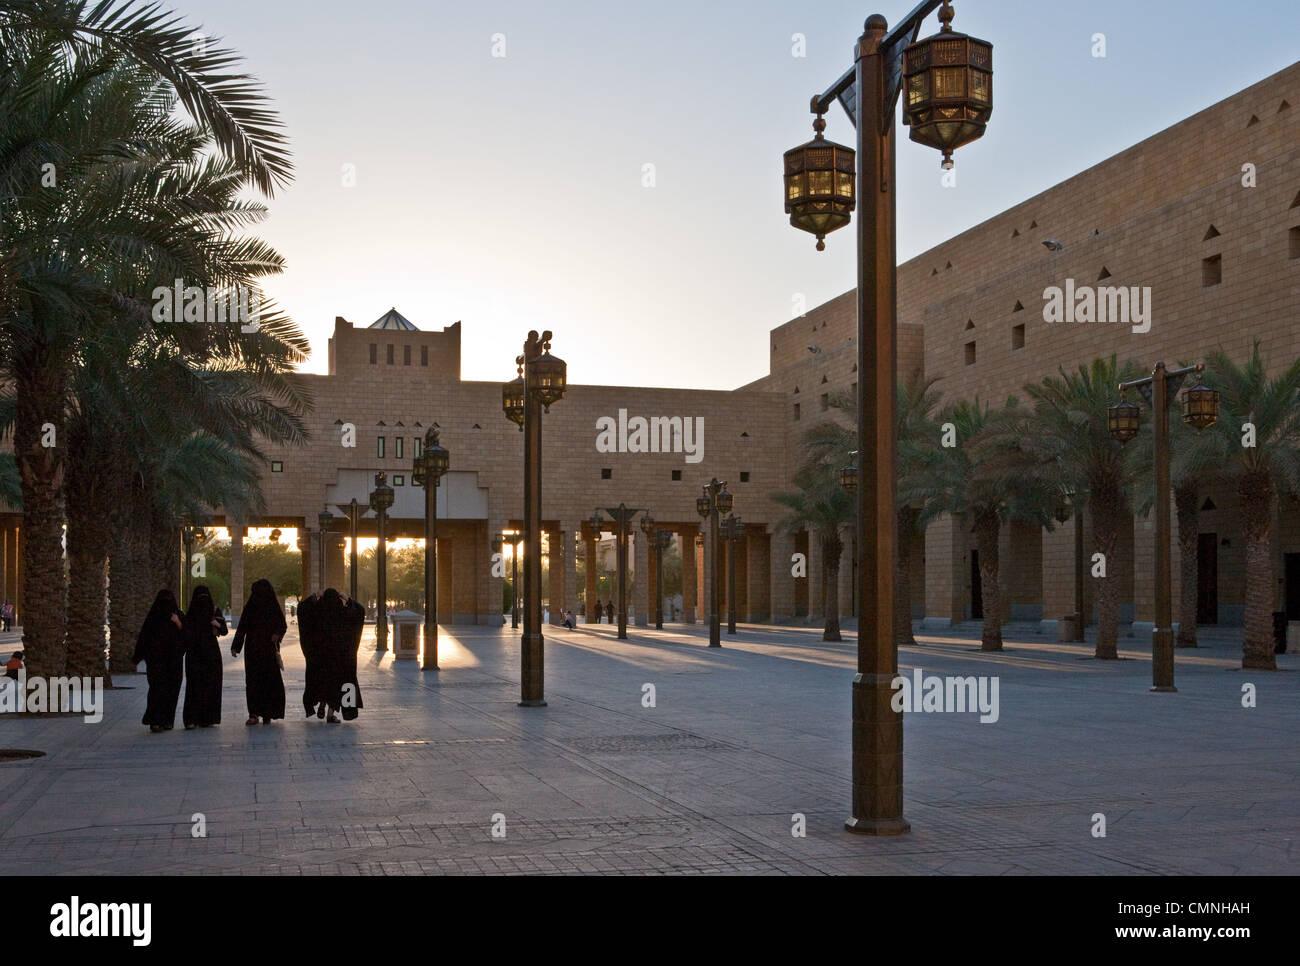 Asia Arabia Saudita Riyadh,la radice quadrata del distretto Al Bathaa Immagini Stock